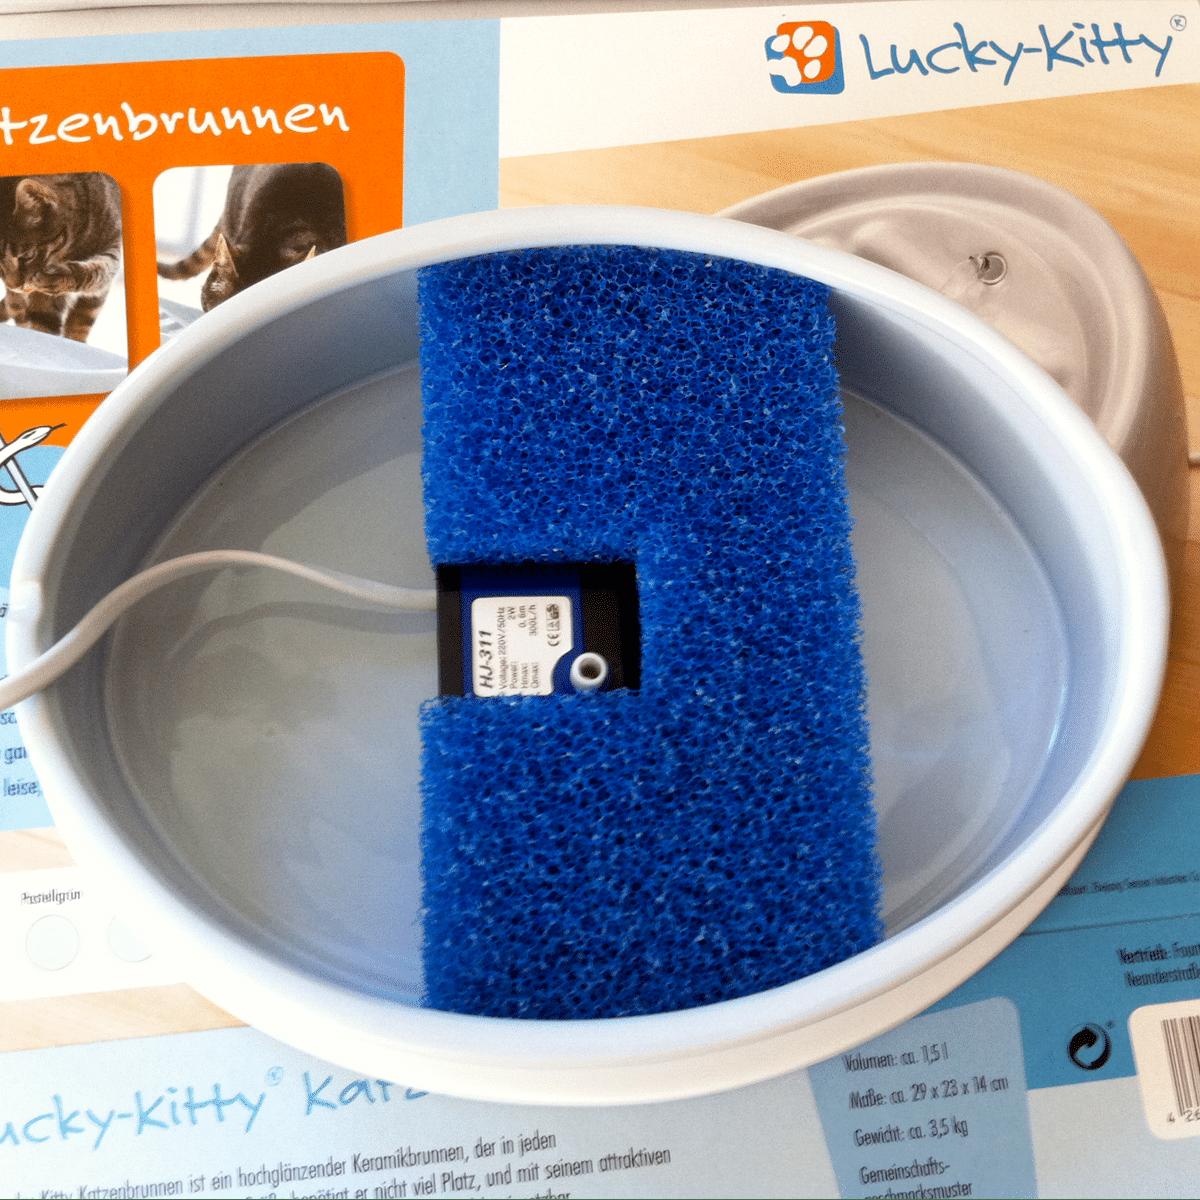 Filter till Lucky Kittys vattenfontän